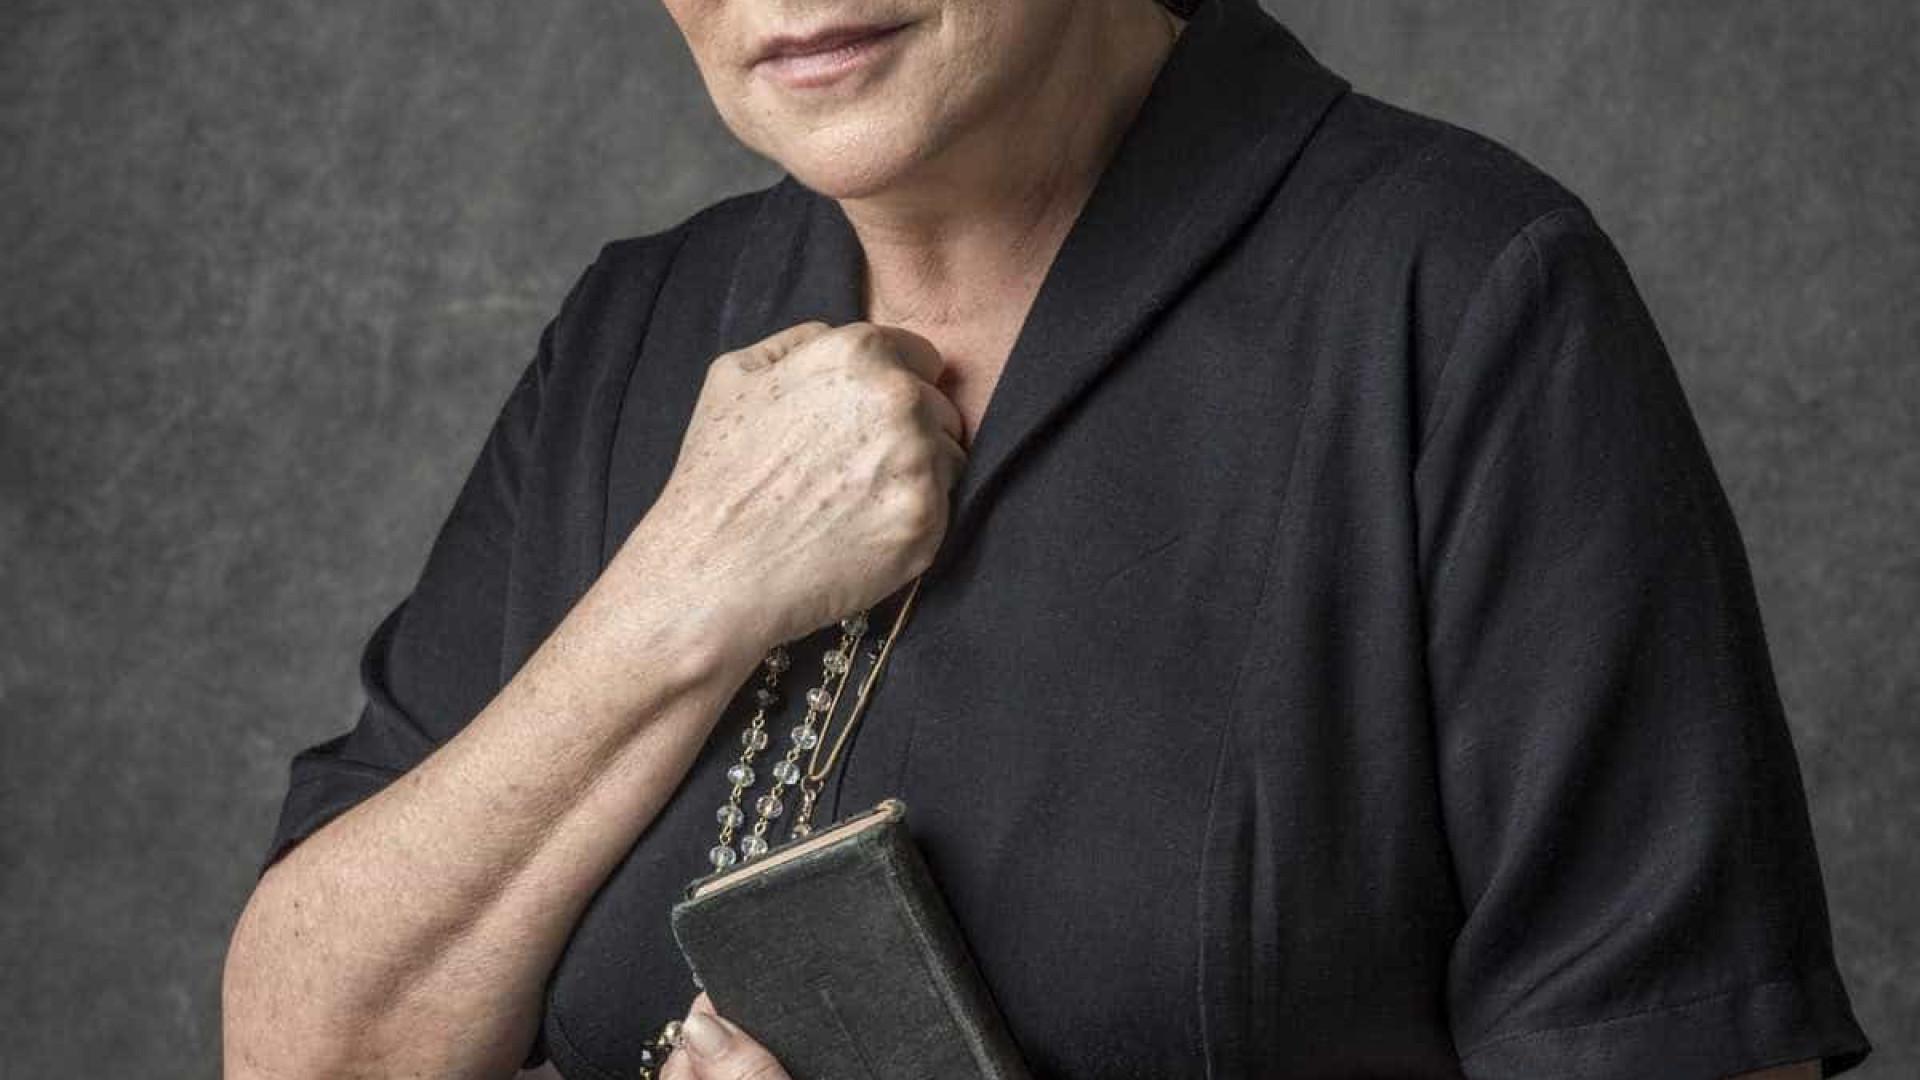 Vilã de Joana Fomm em 'Tieta' inspirou papel de Elizabeth Savalla